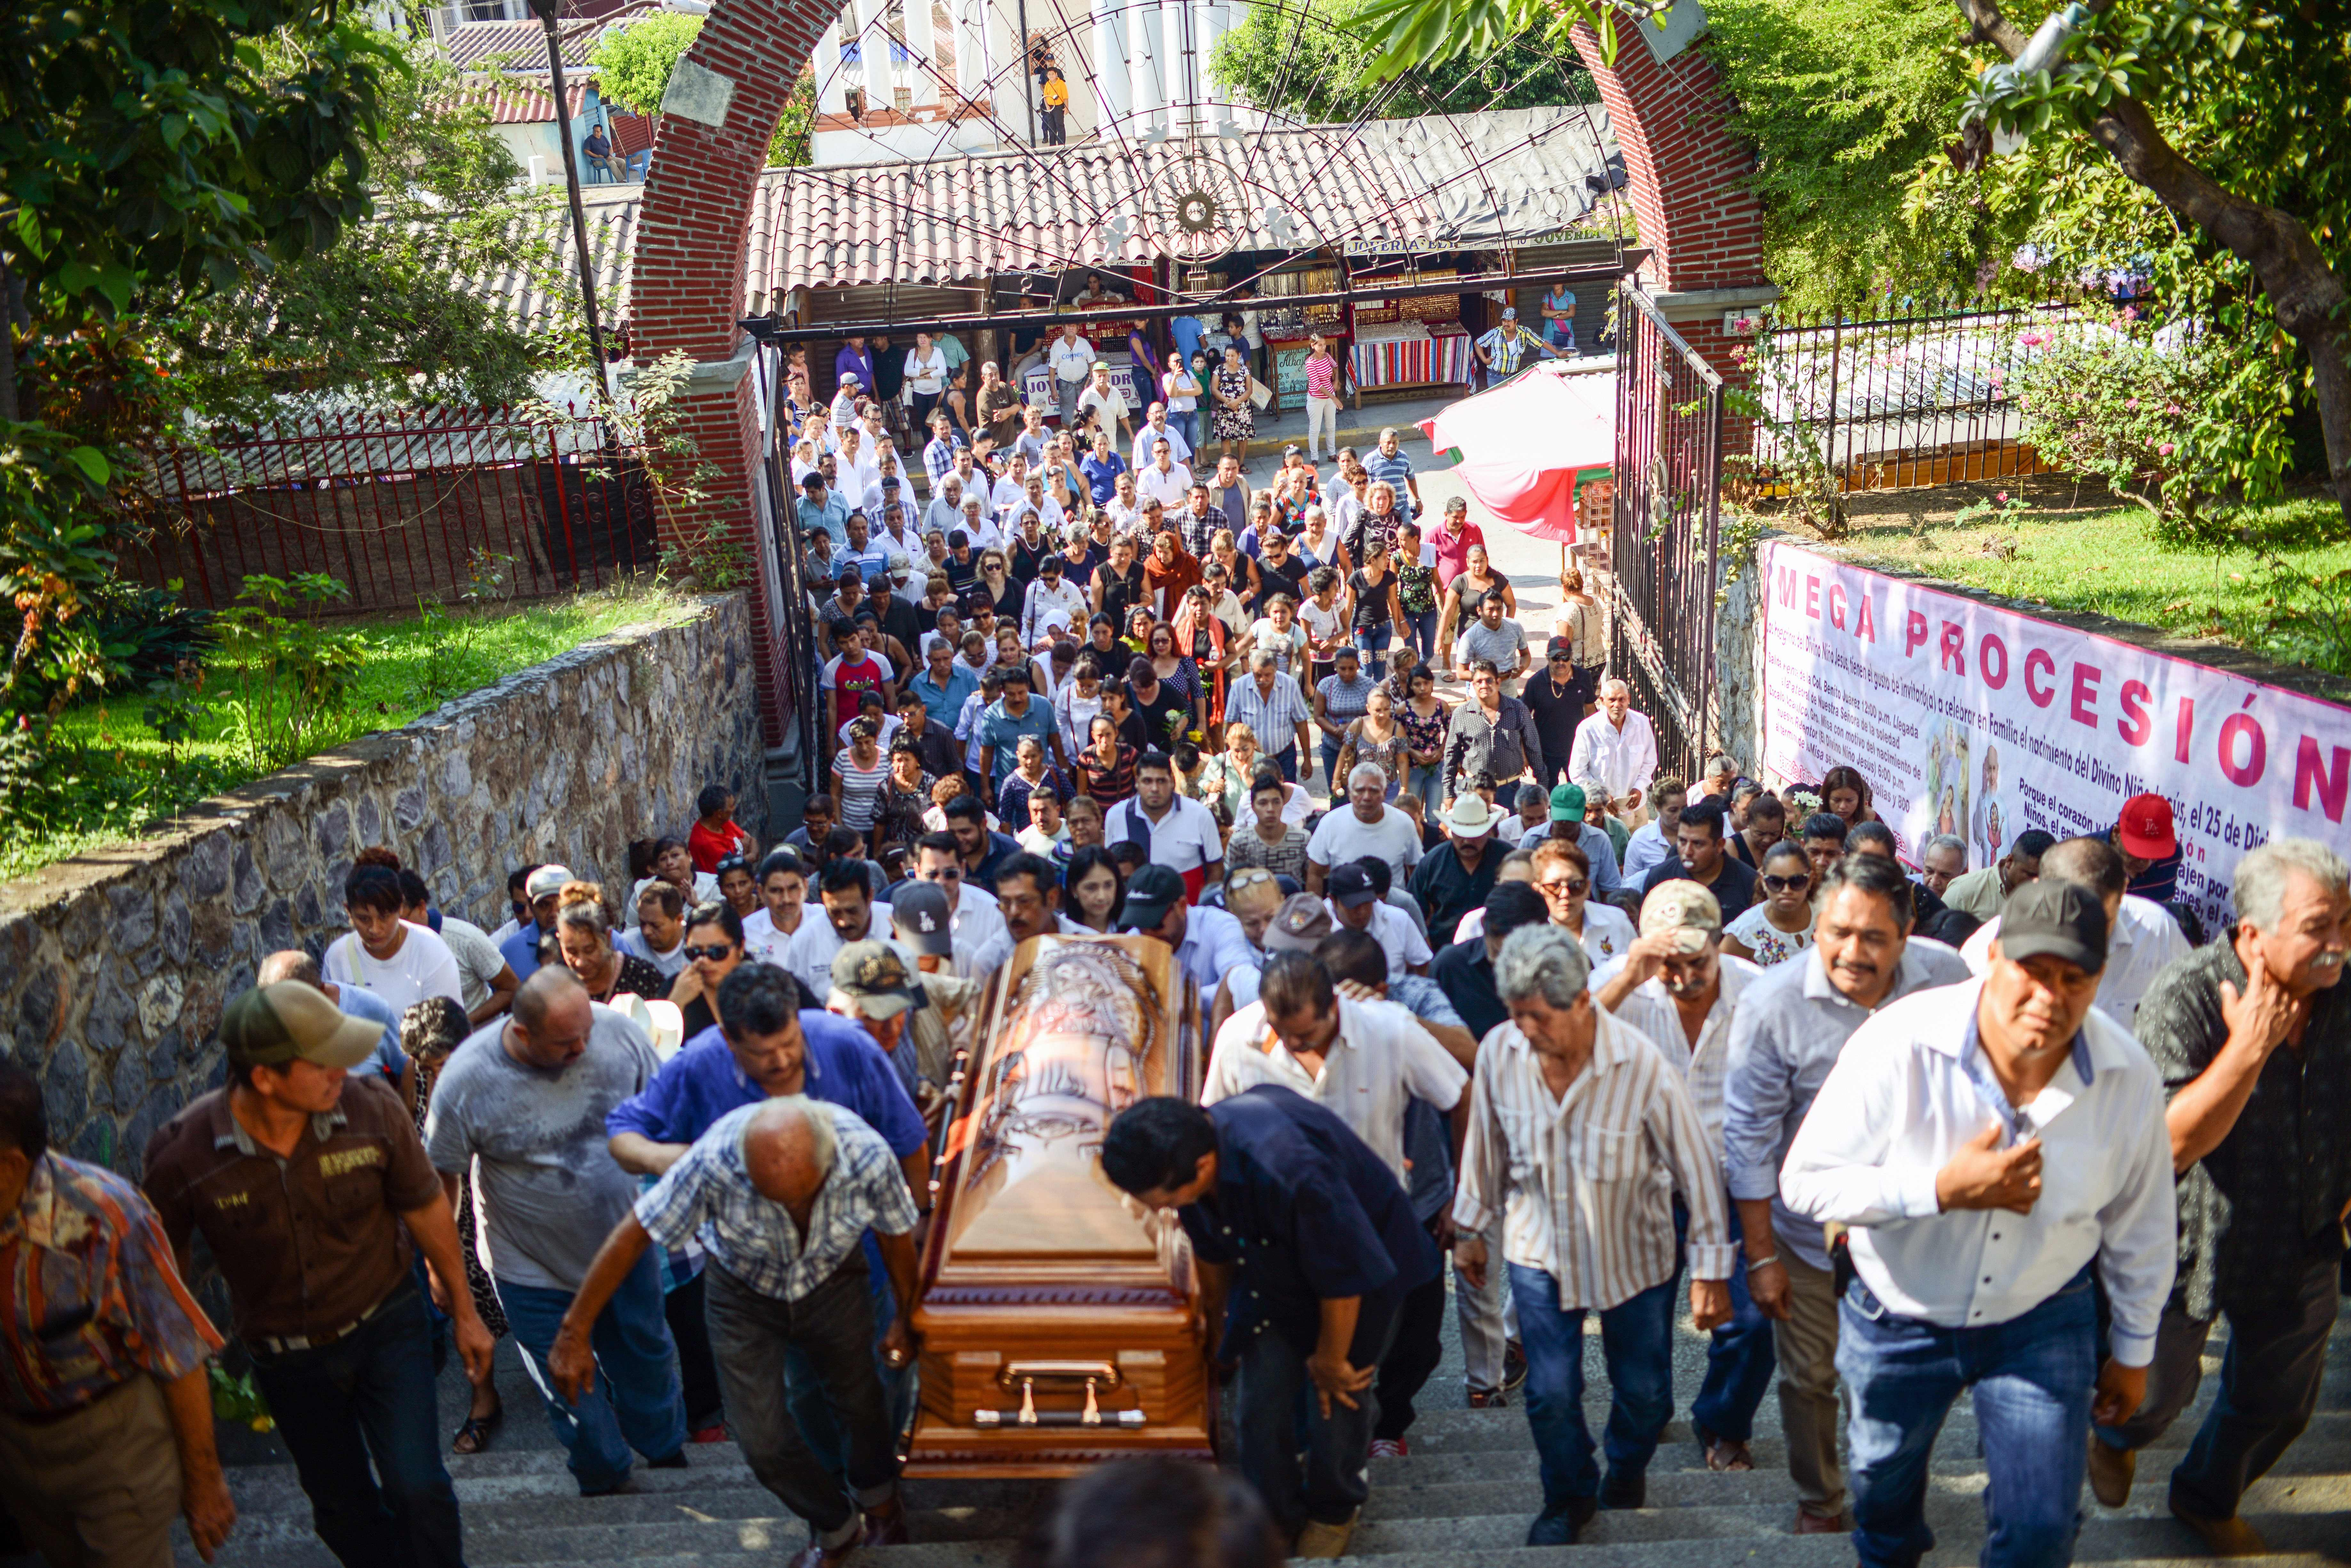 The funeral of Petatlan mayor Arturo Gomez in Guerrero State, Mexico on Dec. 29, 2017.